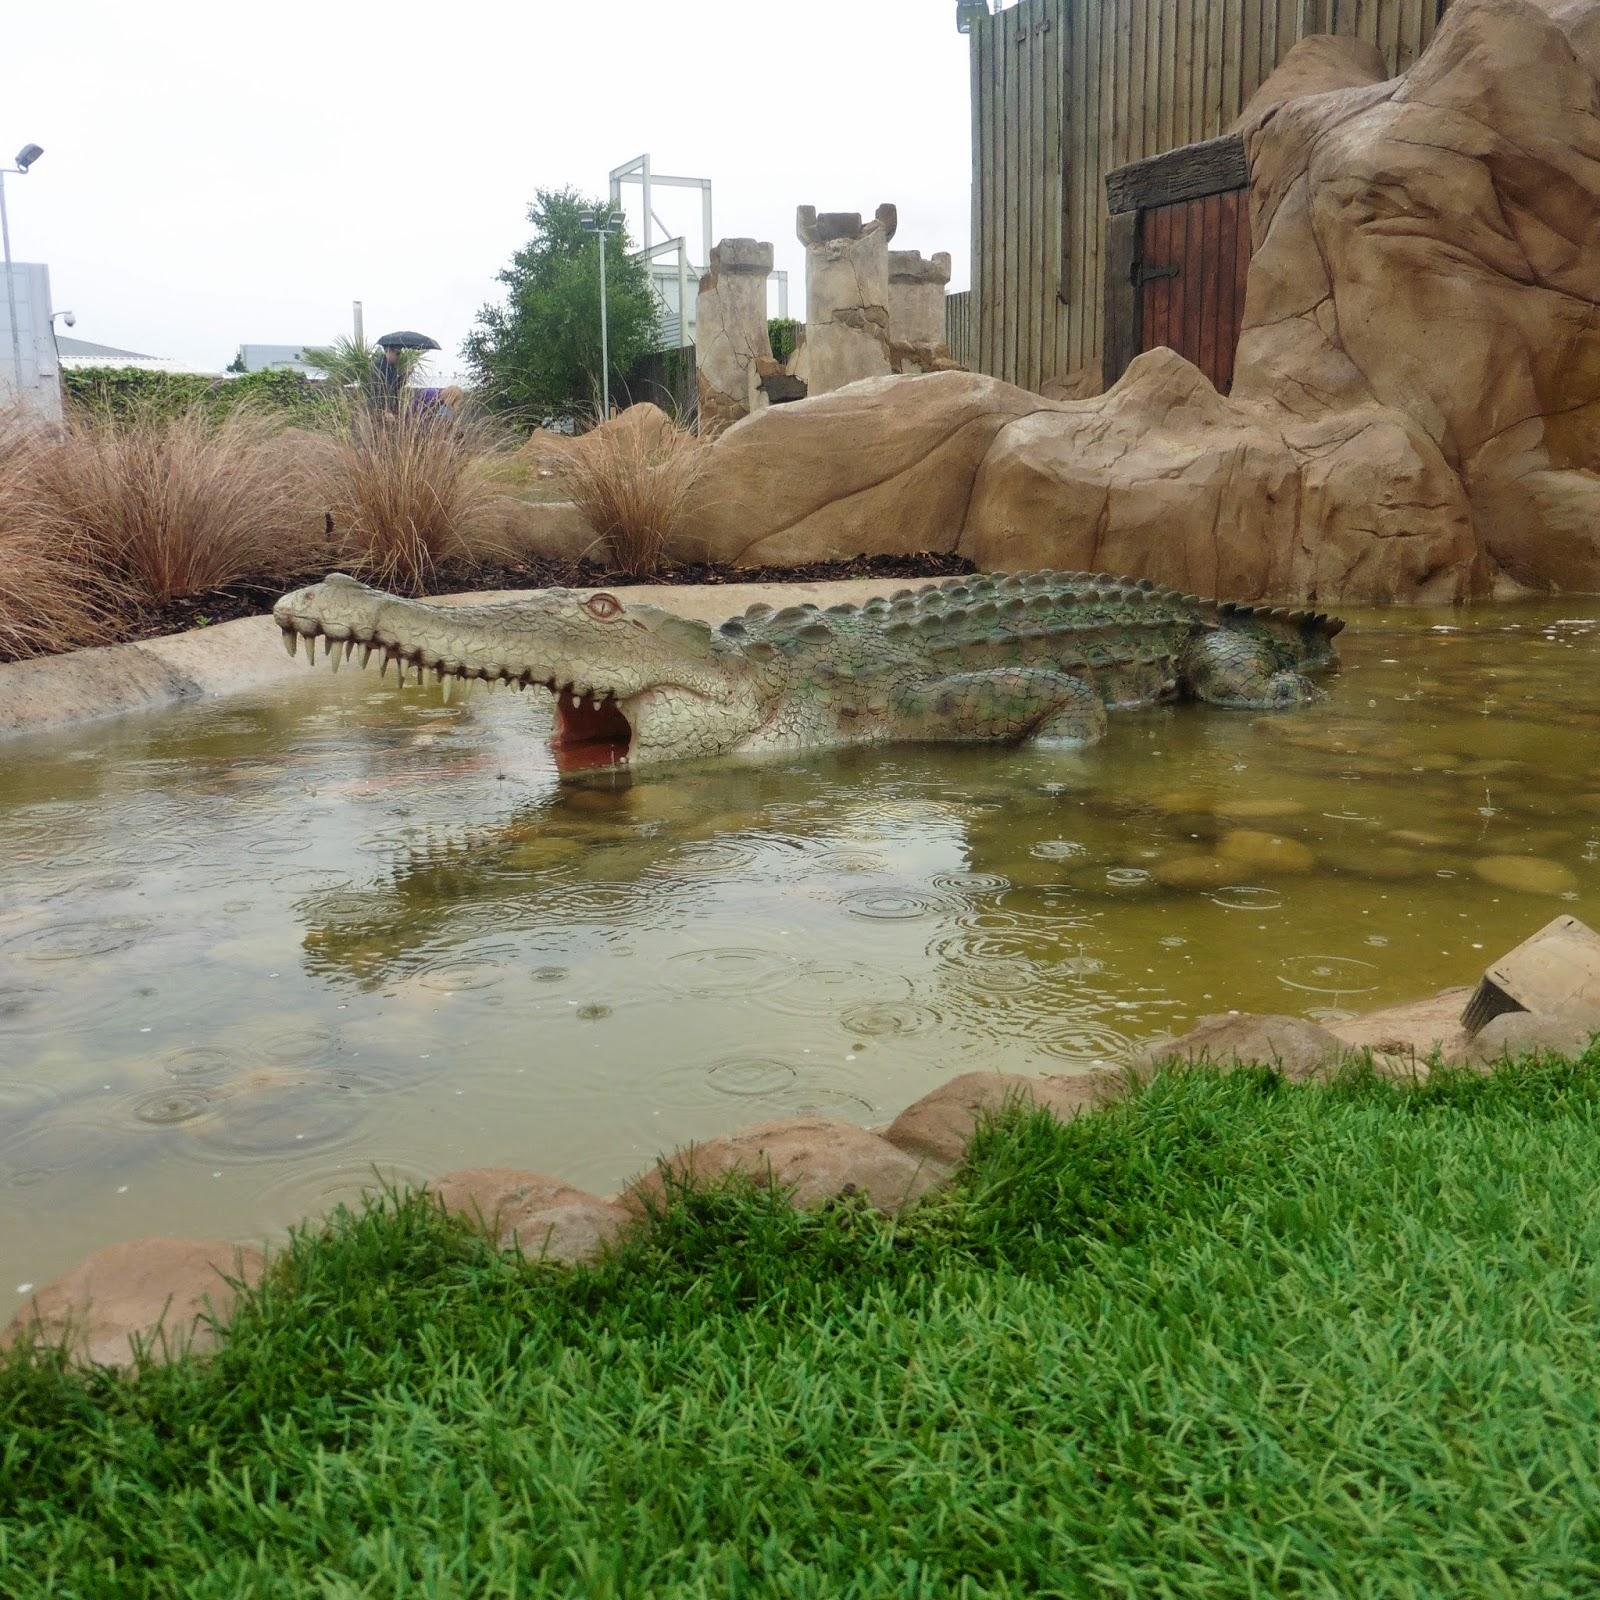 crocodile on golf course